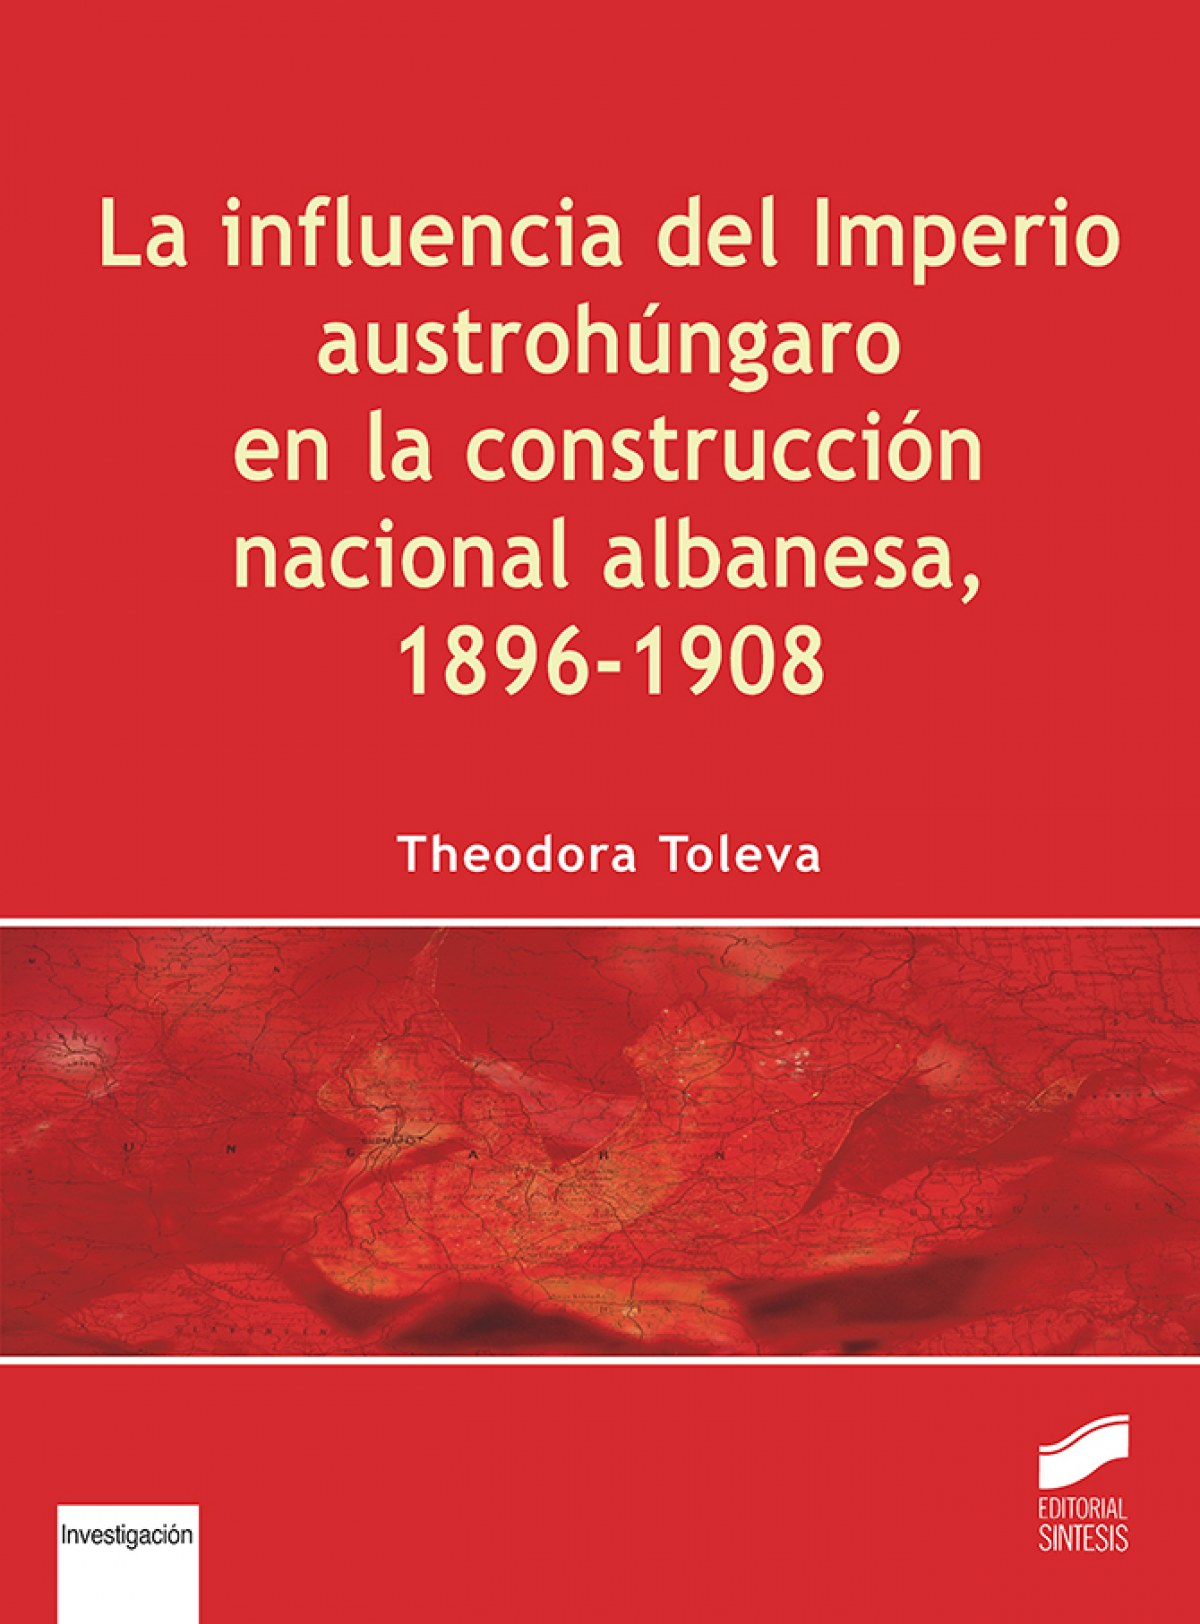 INFLUENCIA DEL IMPERIO AUSTROHUNGARO CONSTRUCCION ALBANESA